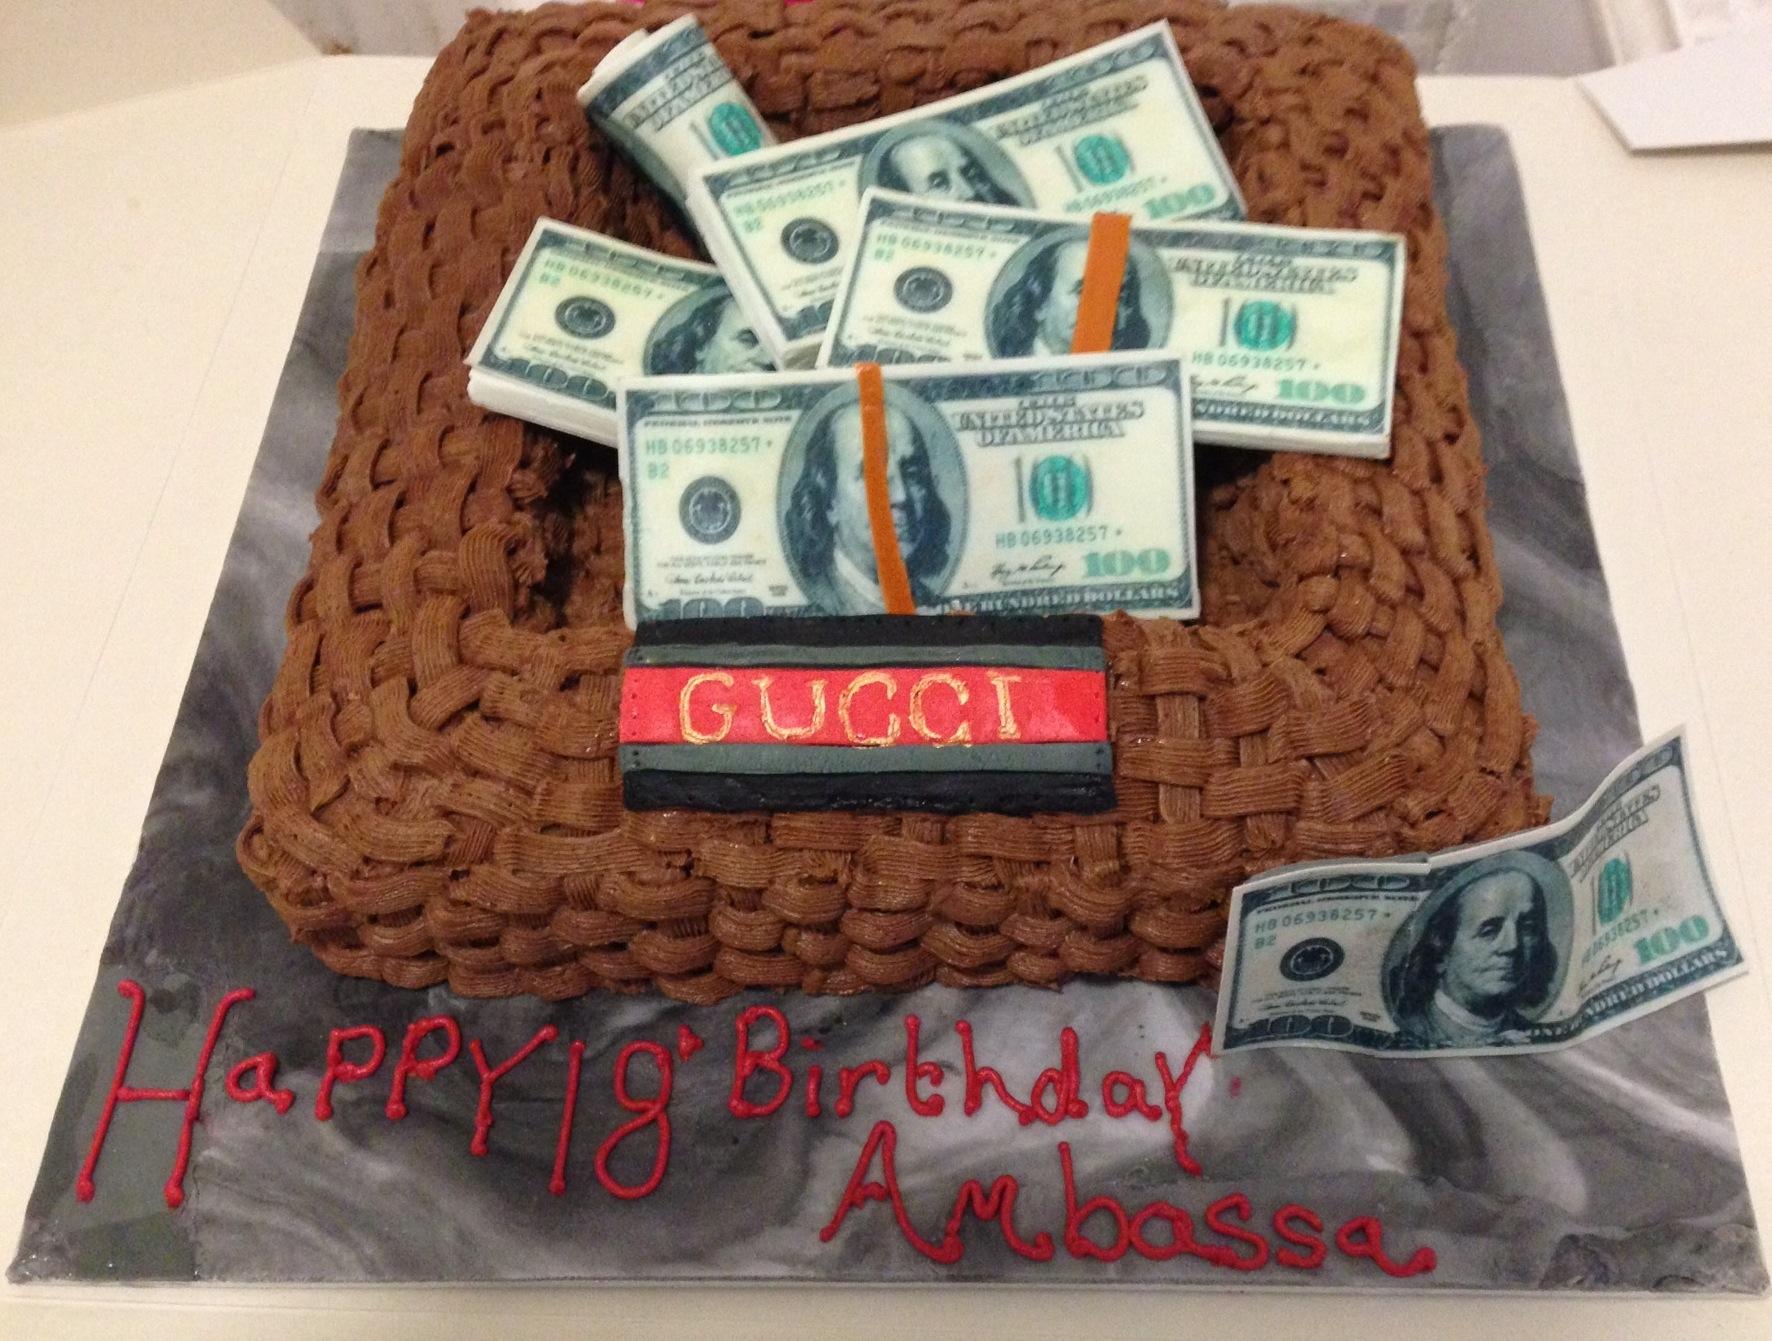 Gucci Money Basket 18th Birthday Cake